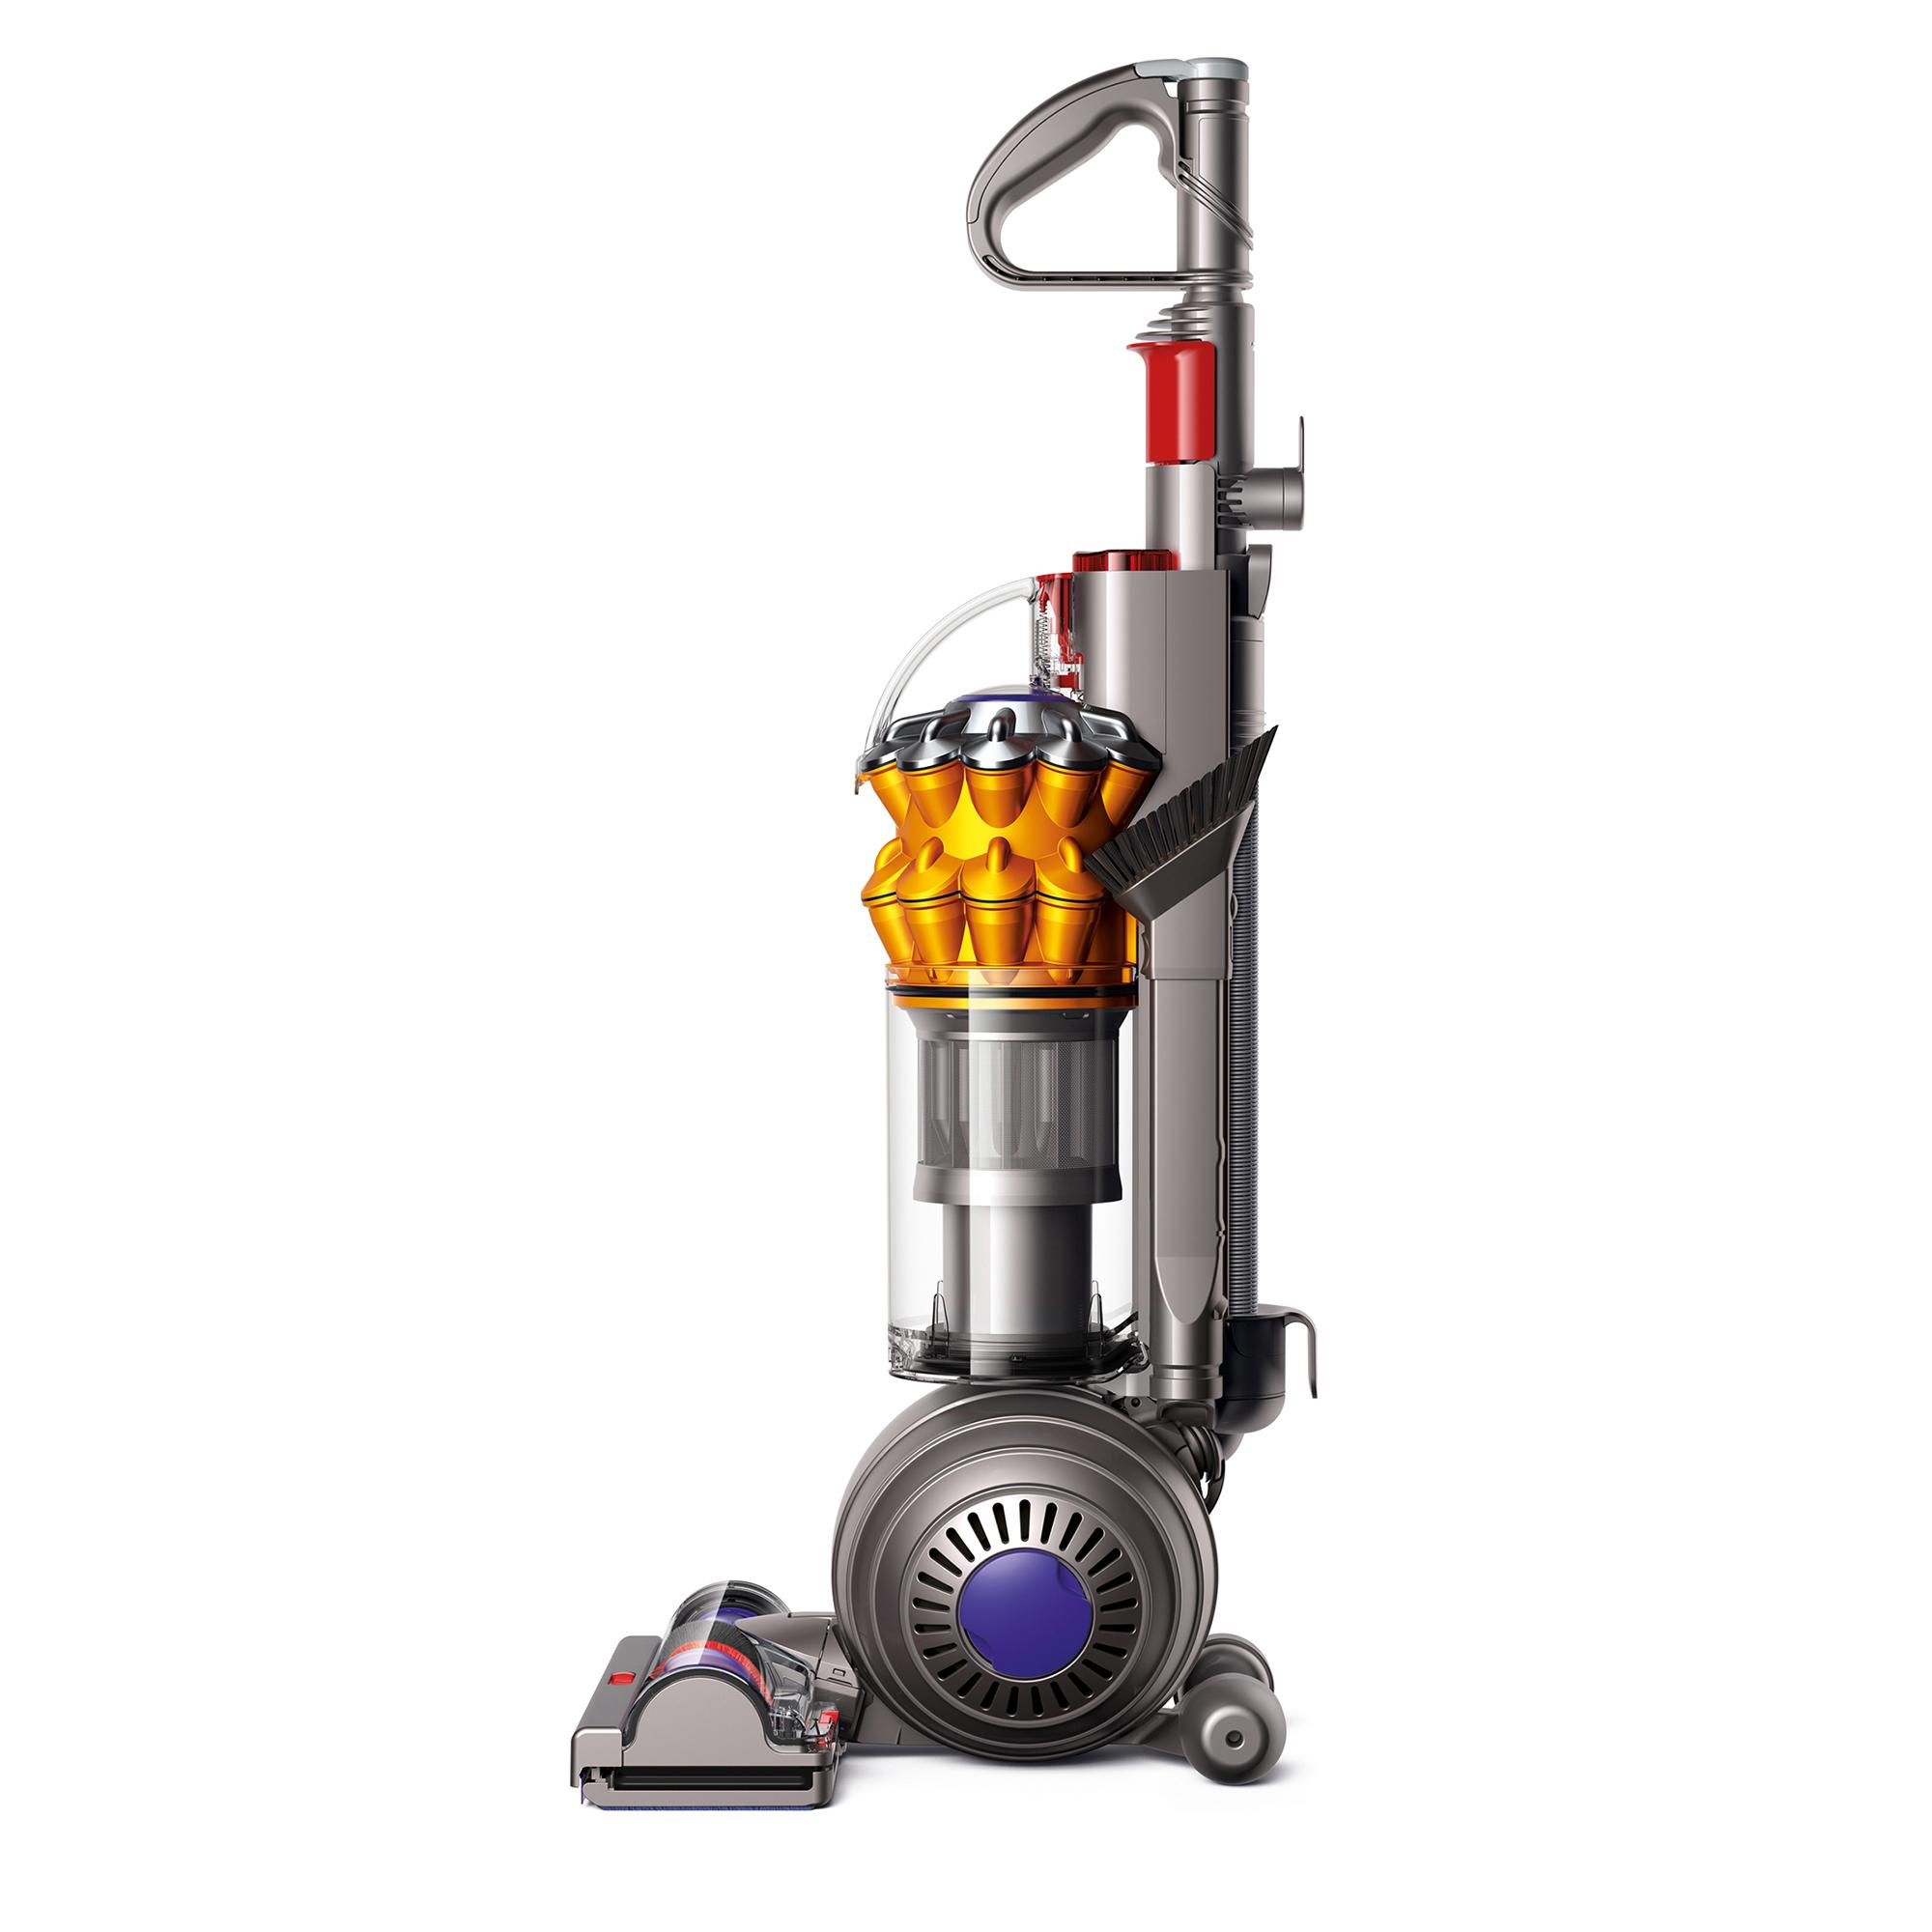 Bob's Vacuum: Vacuum Warranty